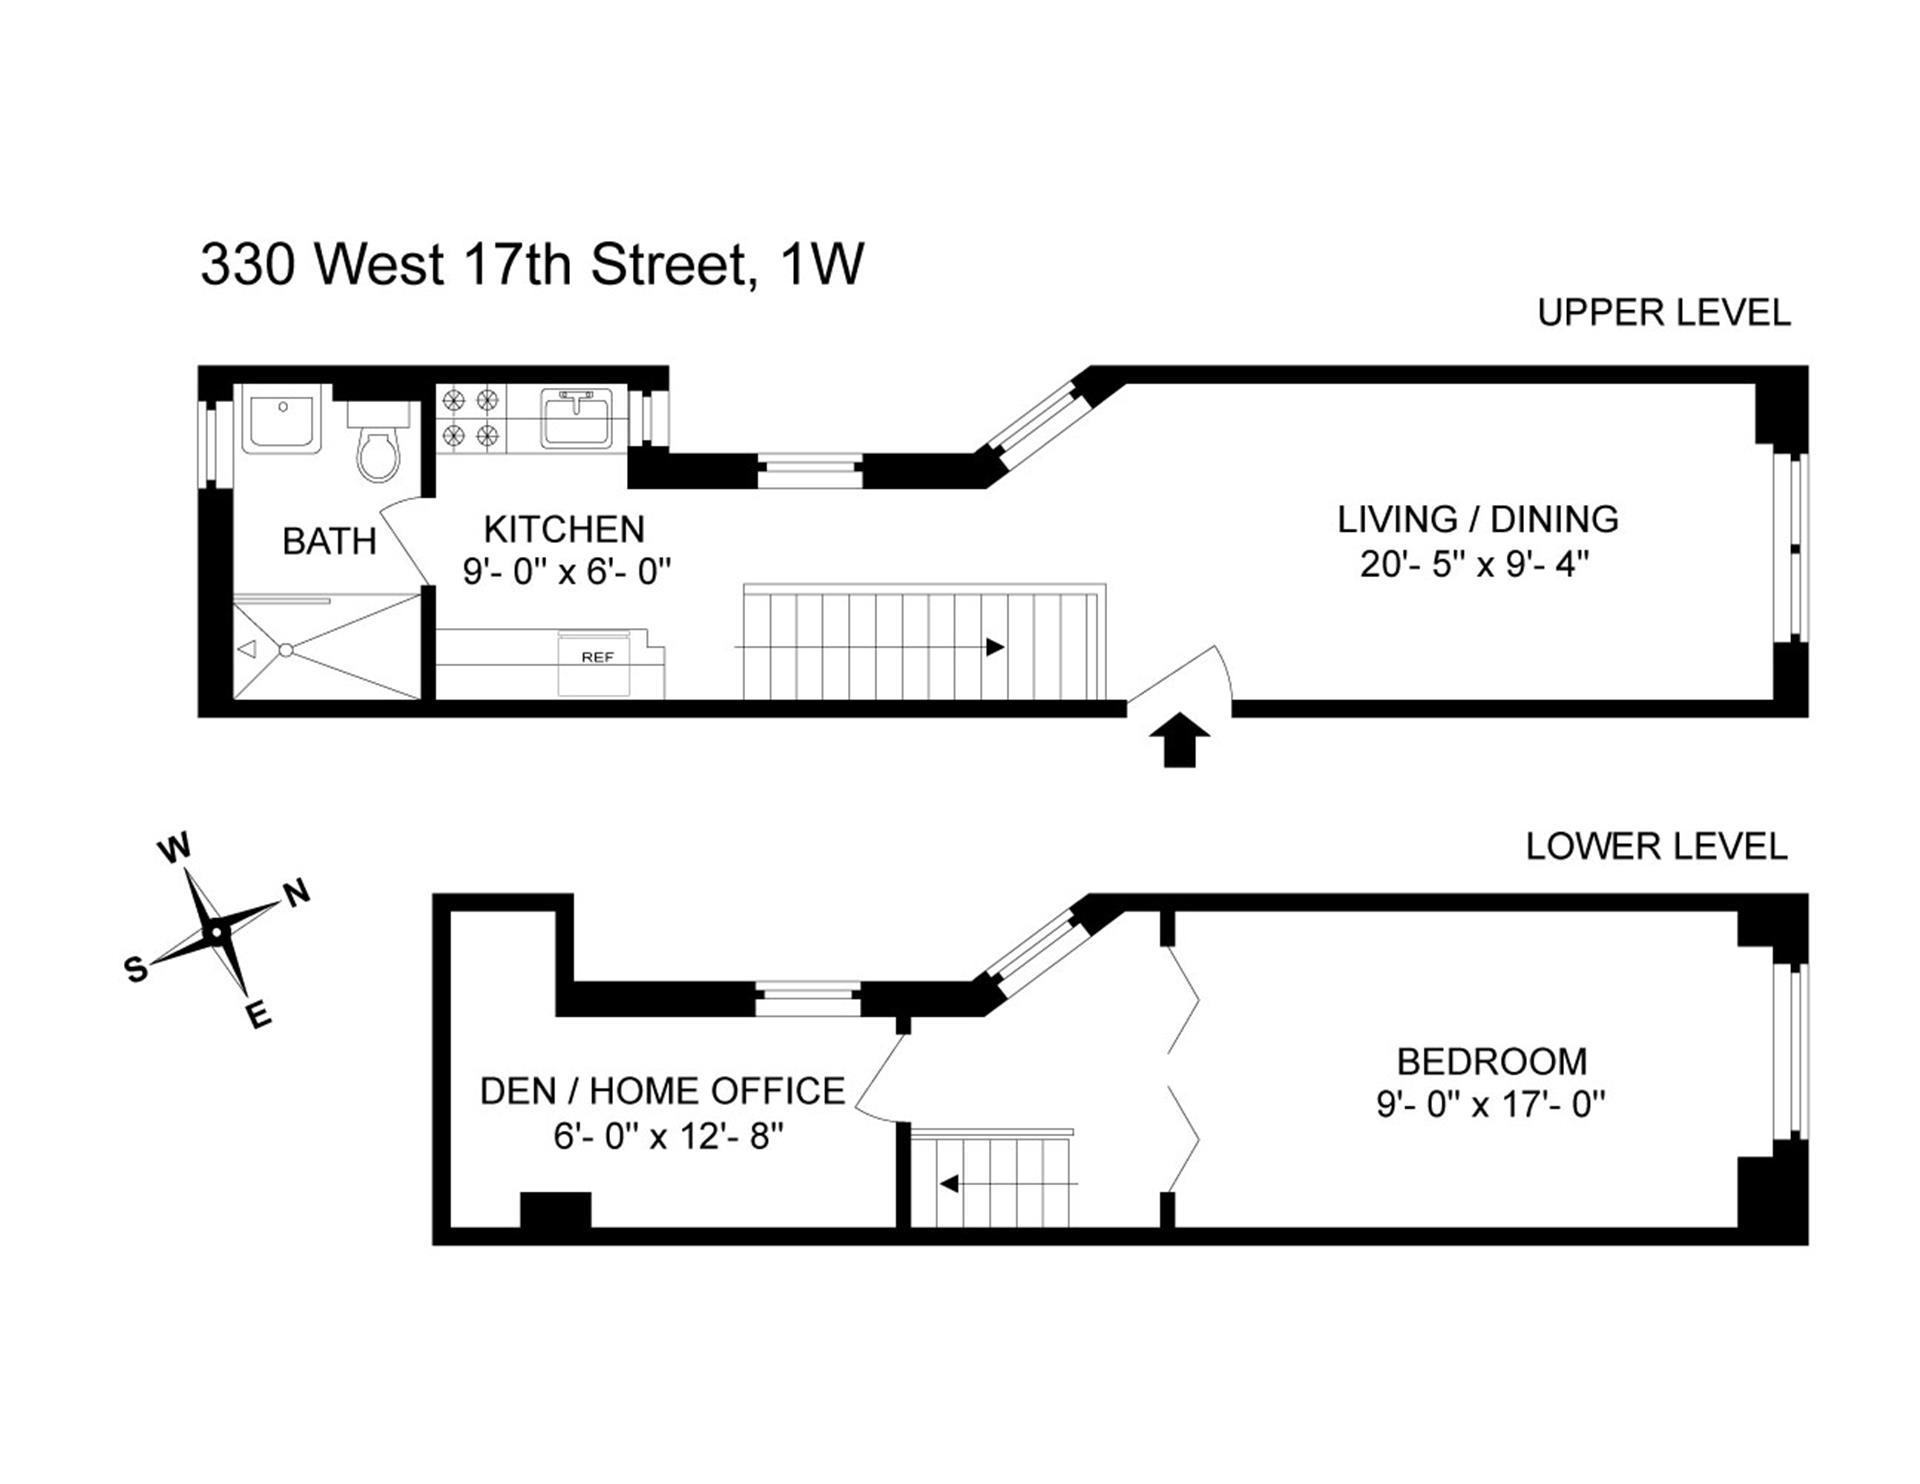 Floor plan of 330 West 17th Street, 1W - Chelsea, New York